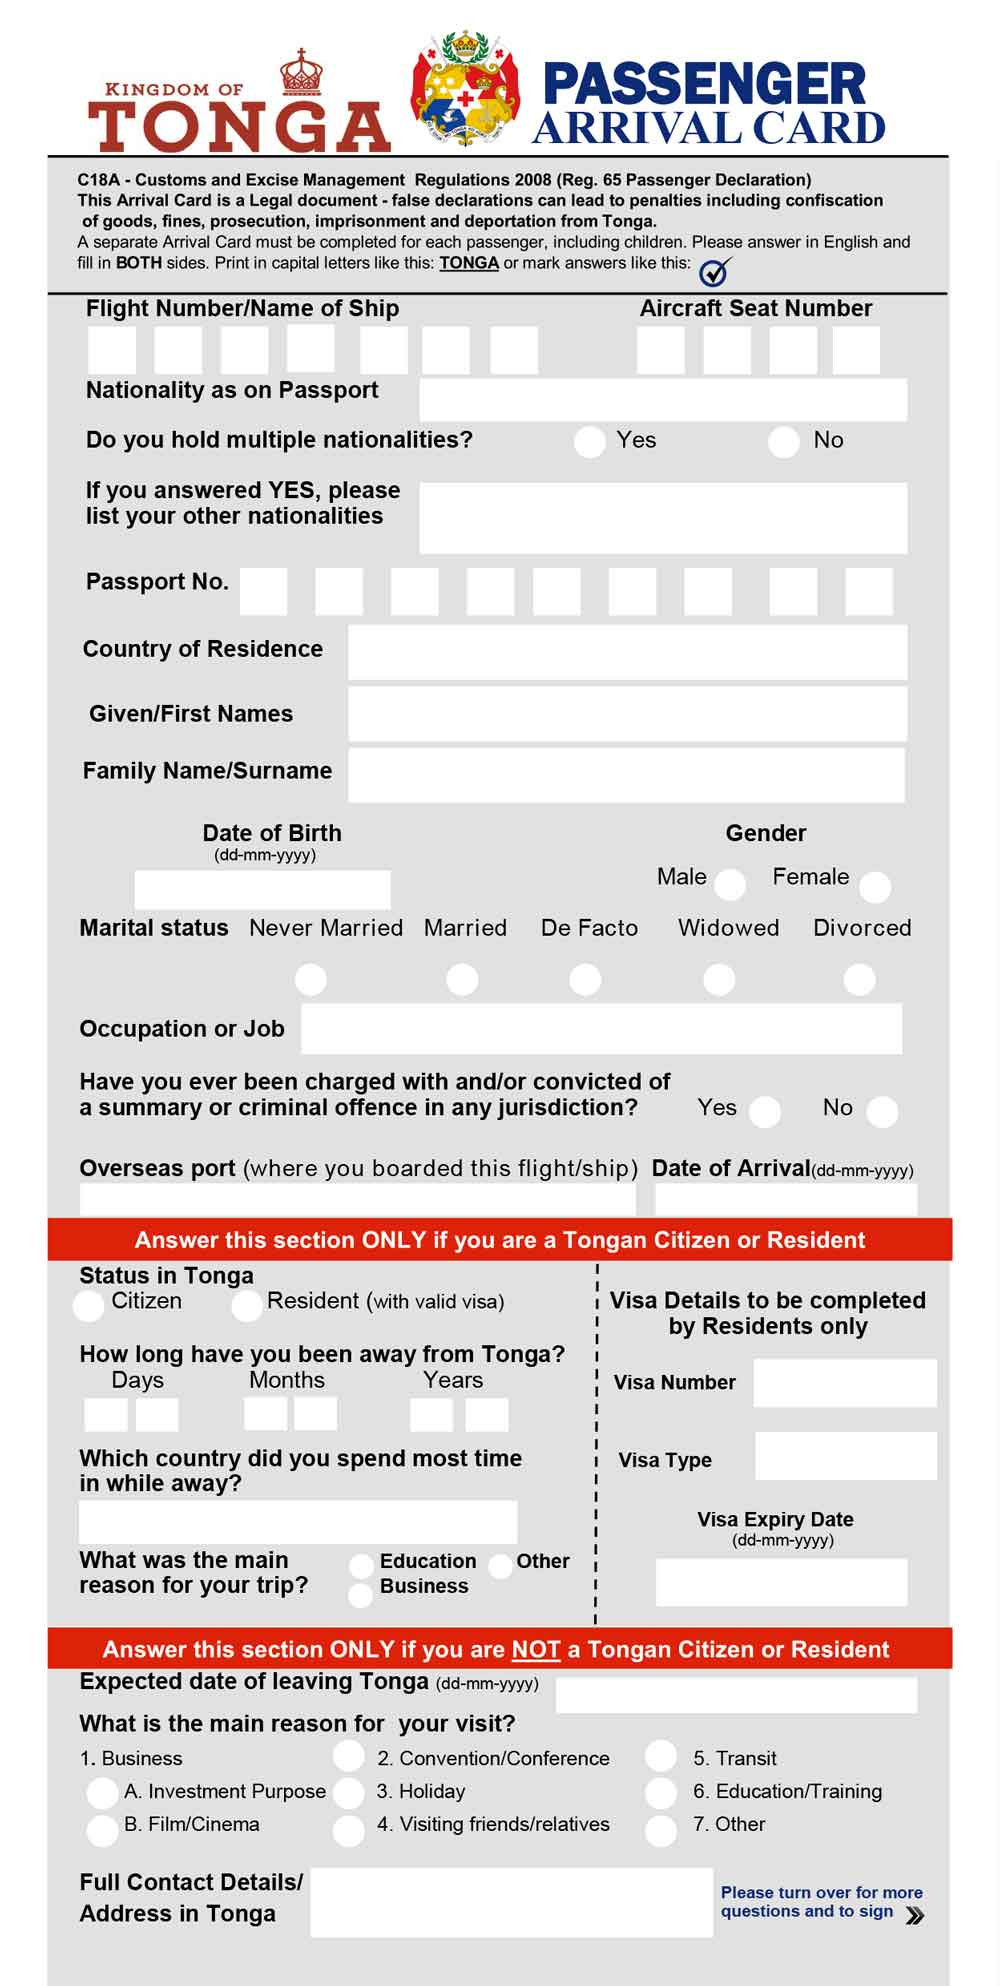 Tonga Passenger Arrival Card Front